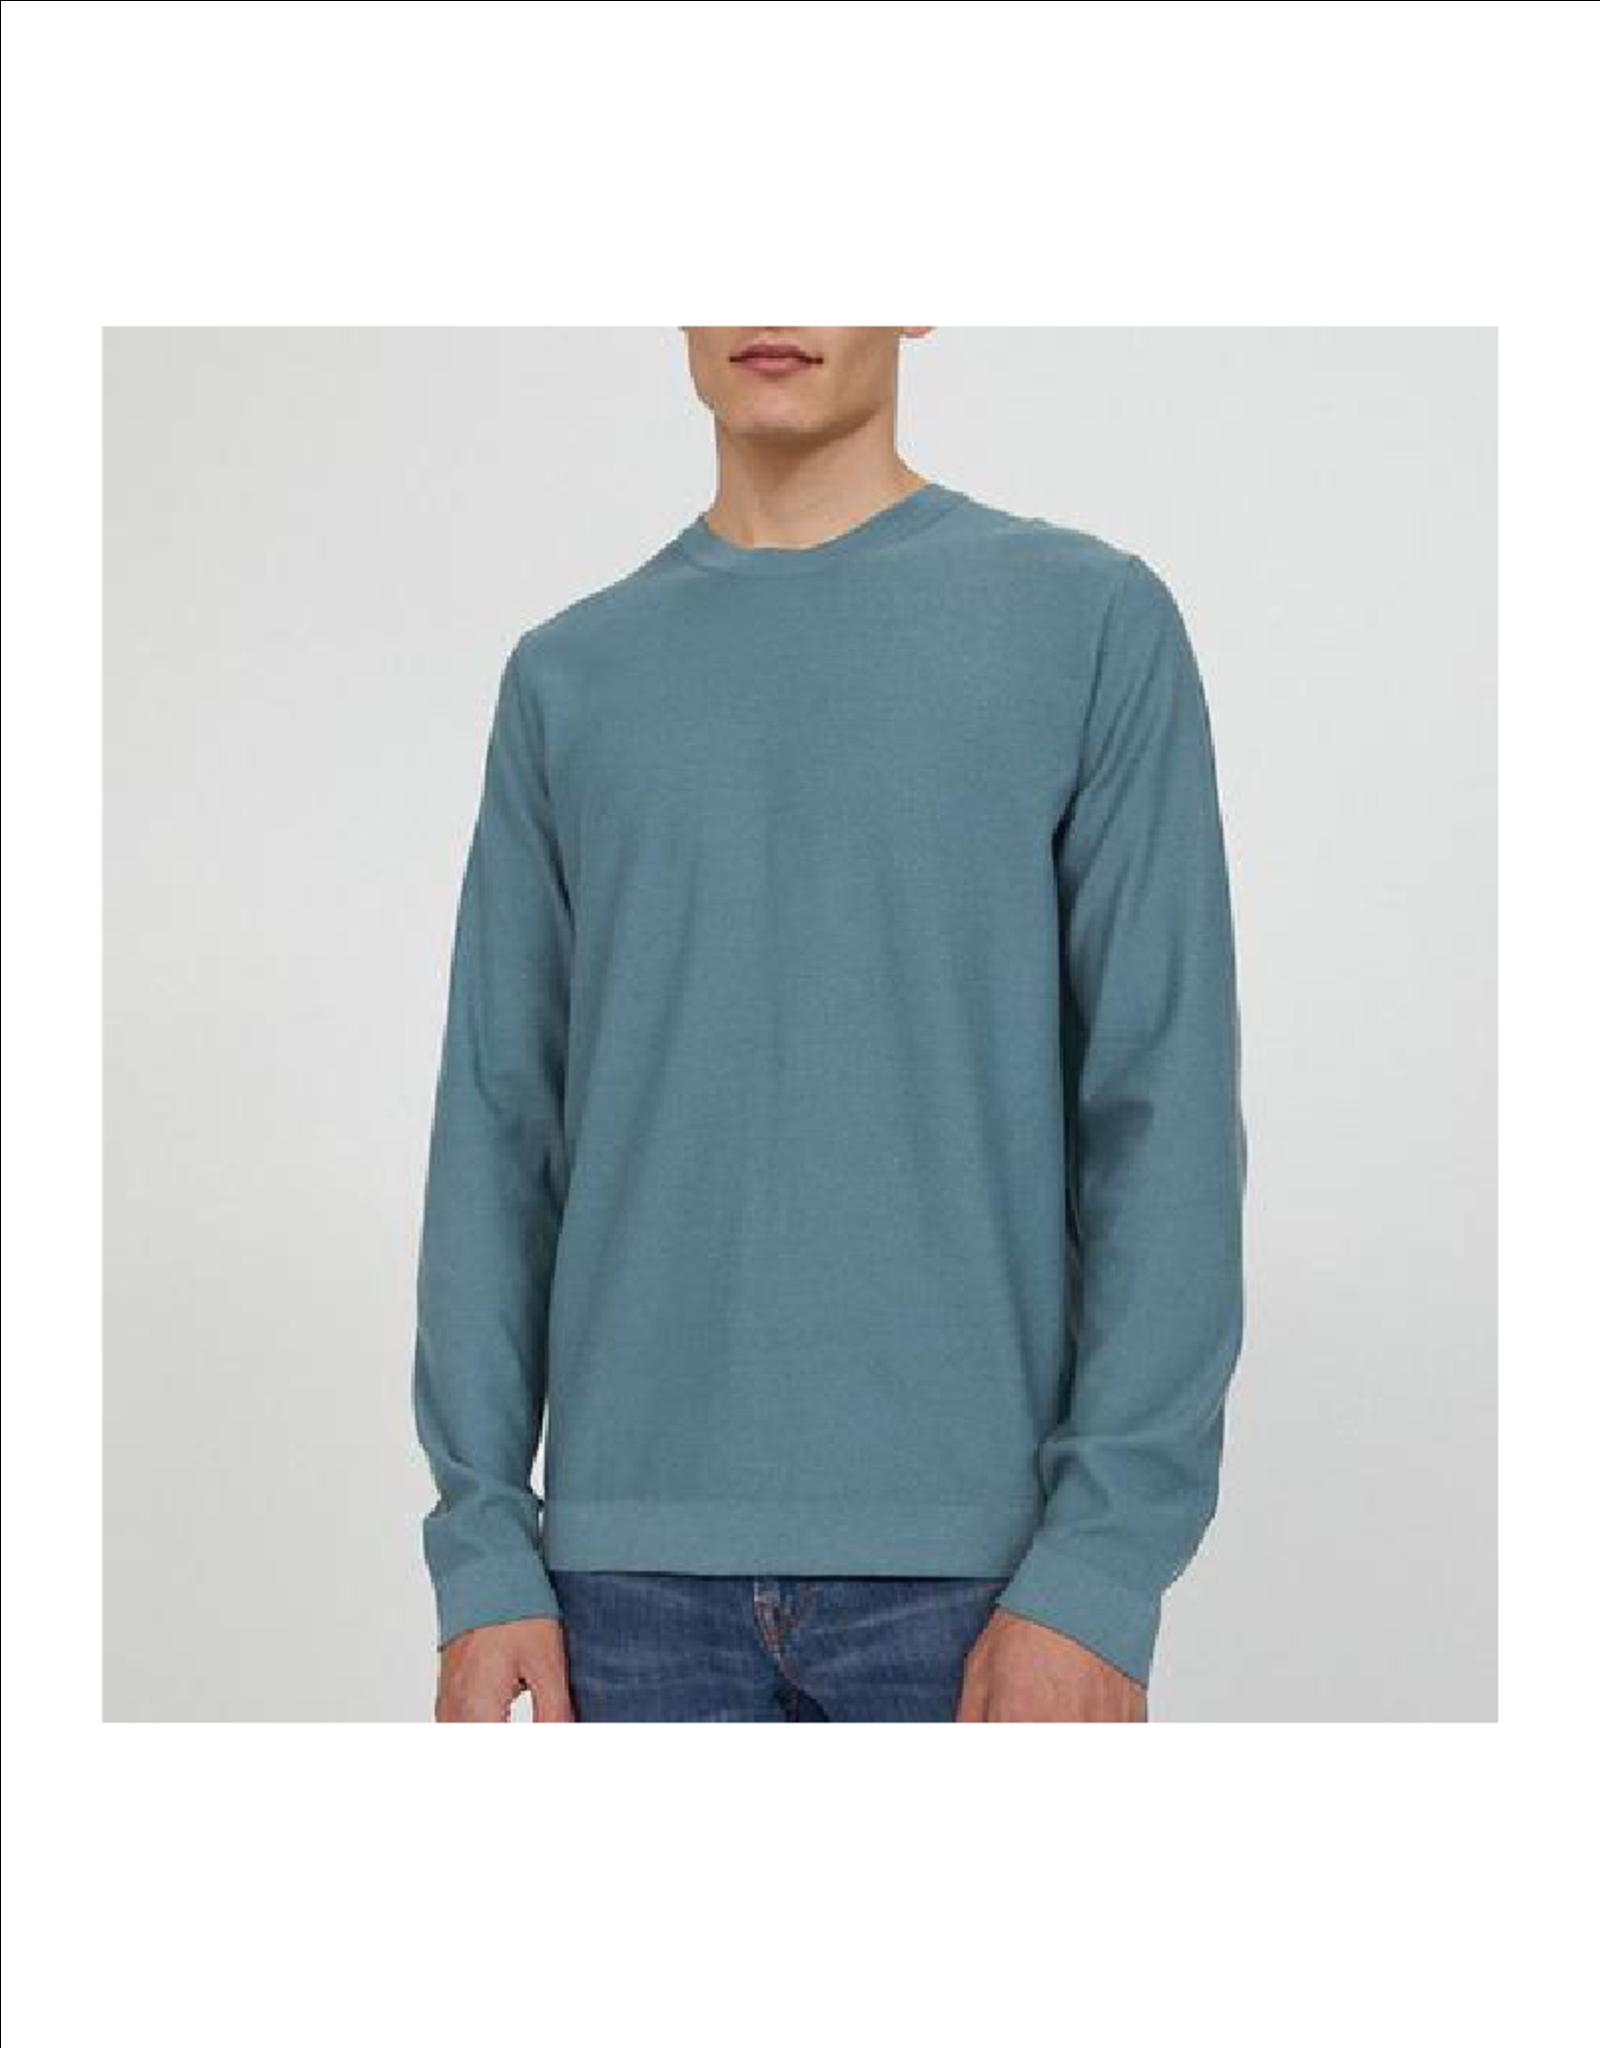 Armedangels Organic Cotton Crew Neck Sweater